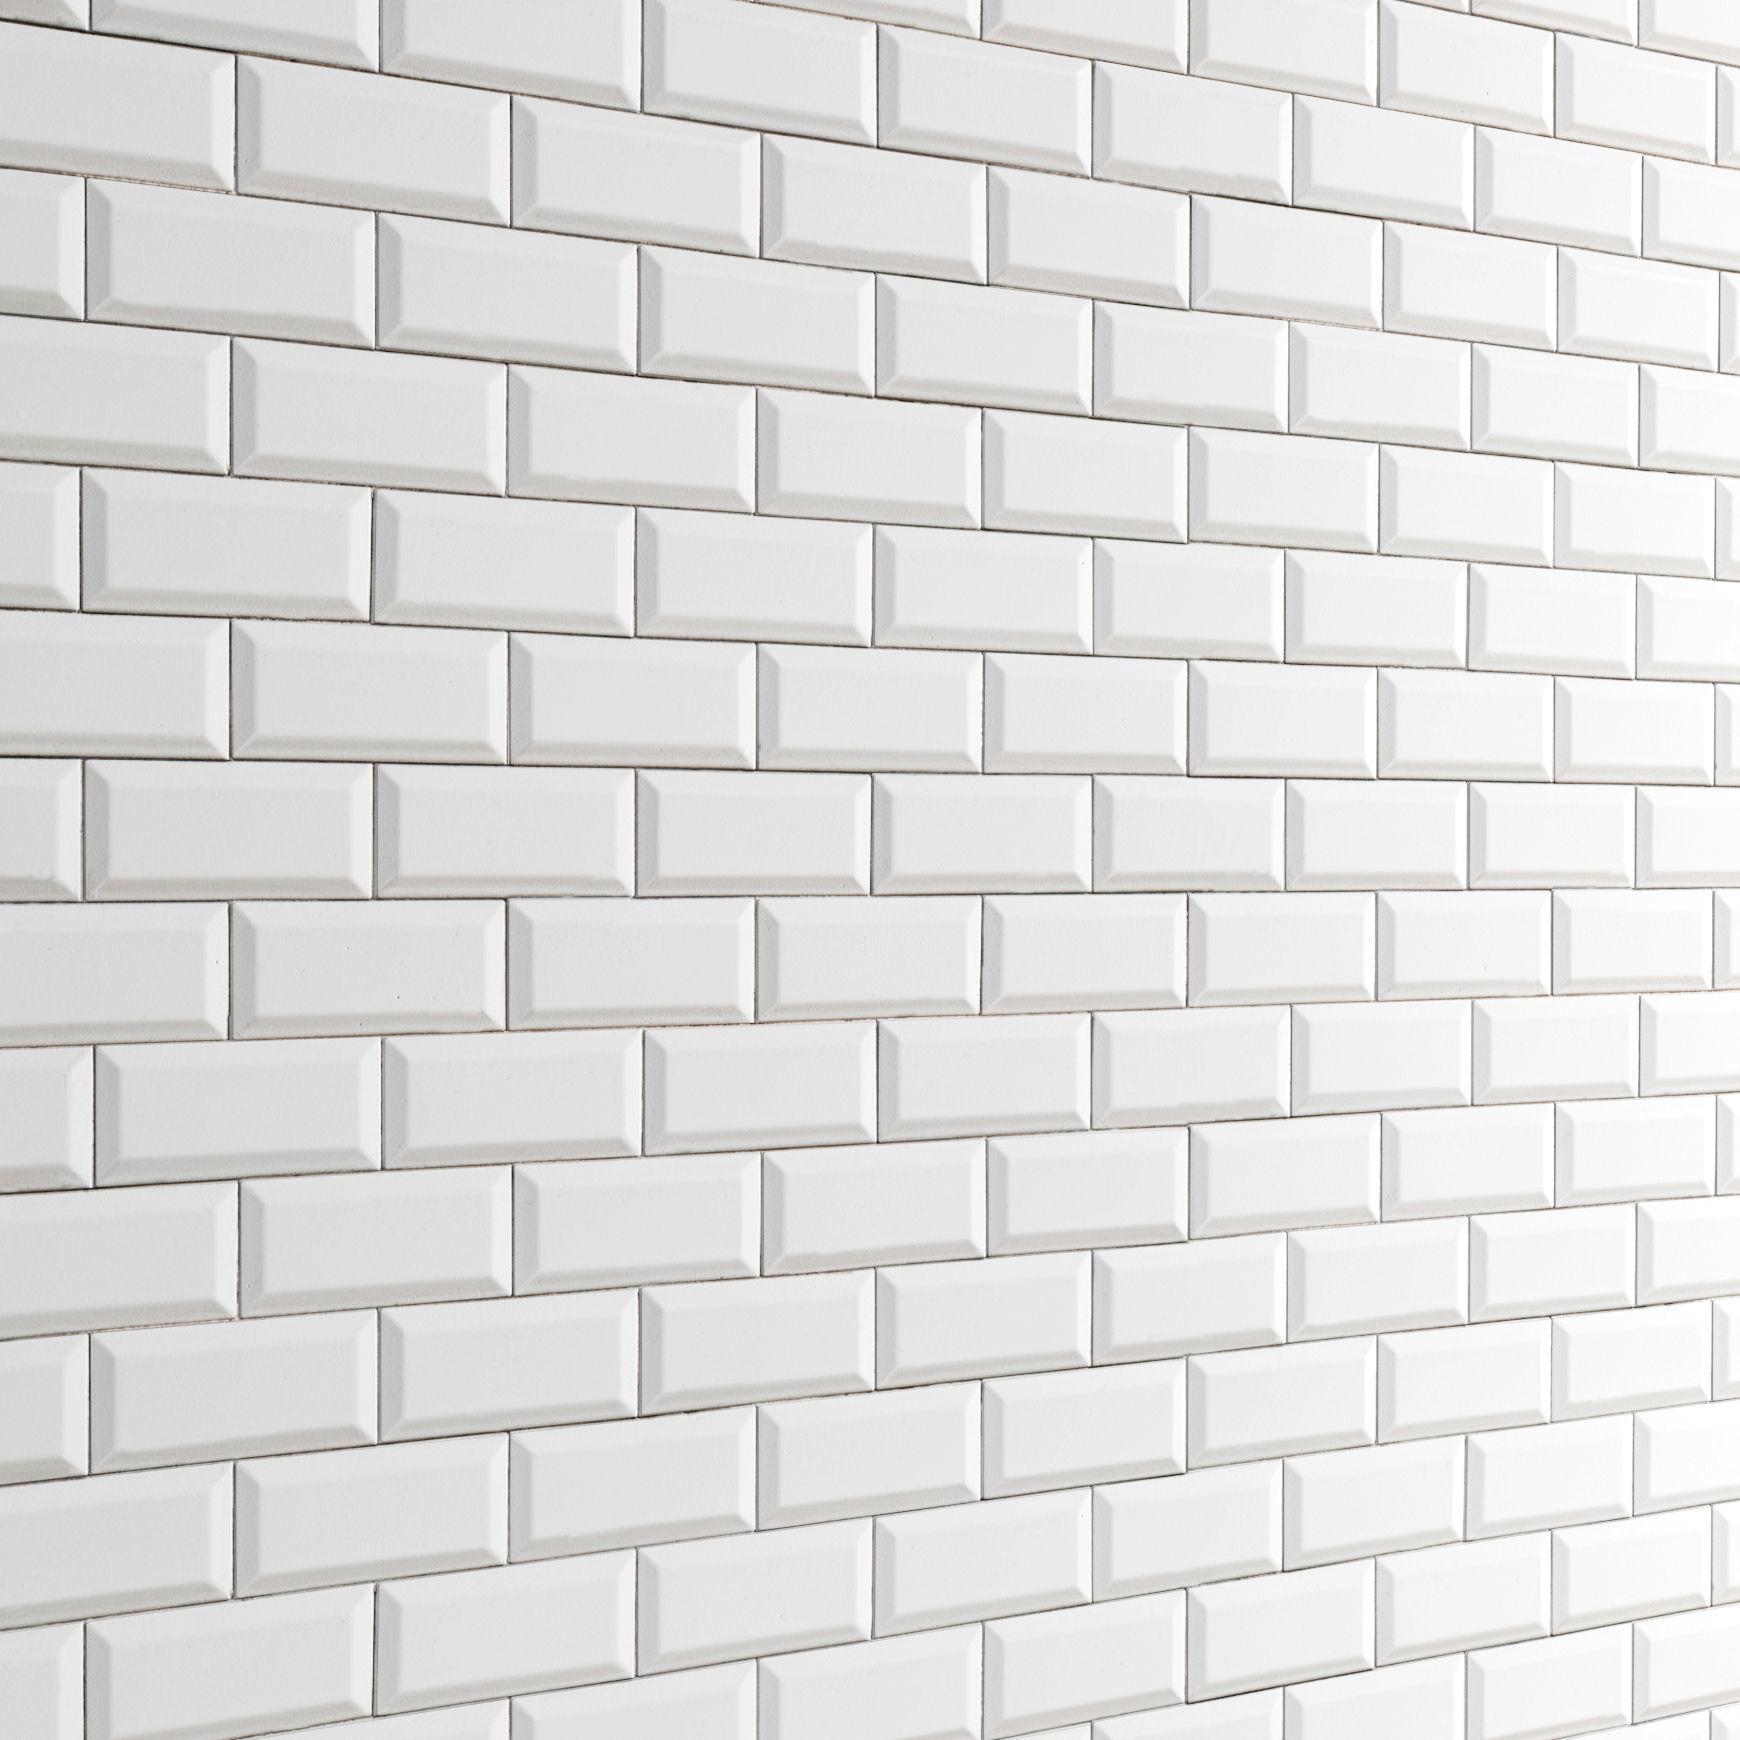 Wall tiles 3D model   CGTrader on Tile Models  id=35640